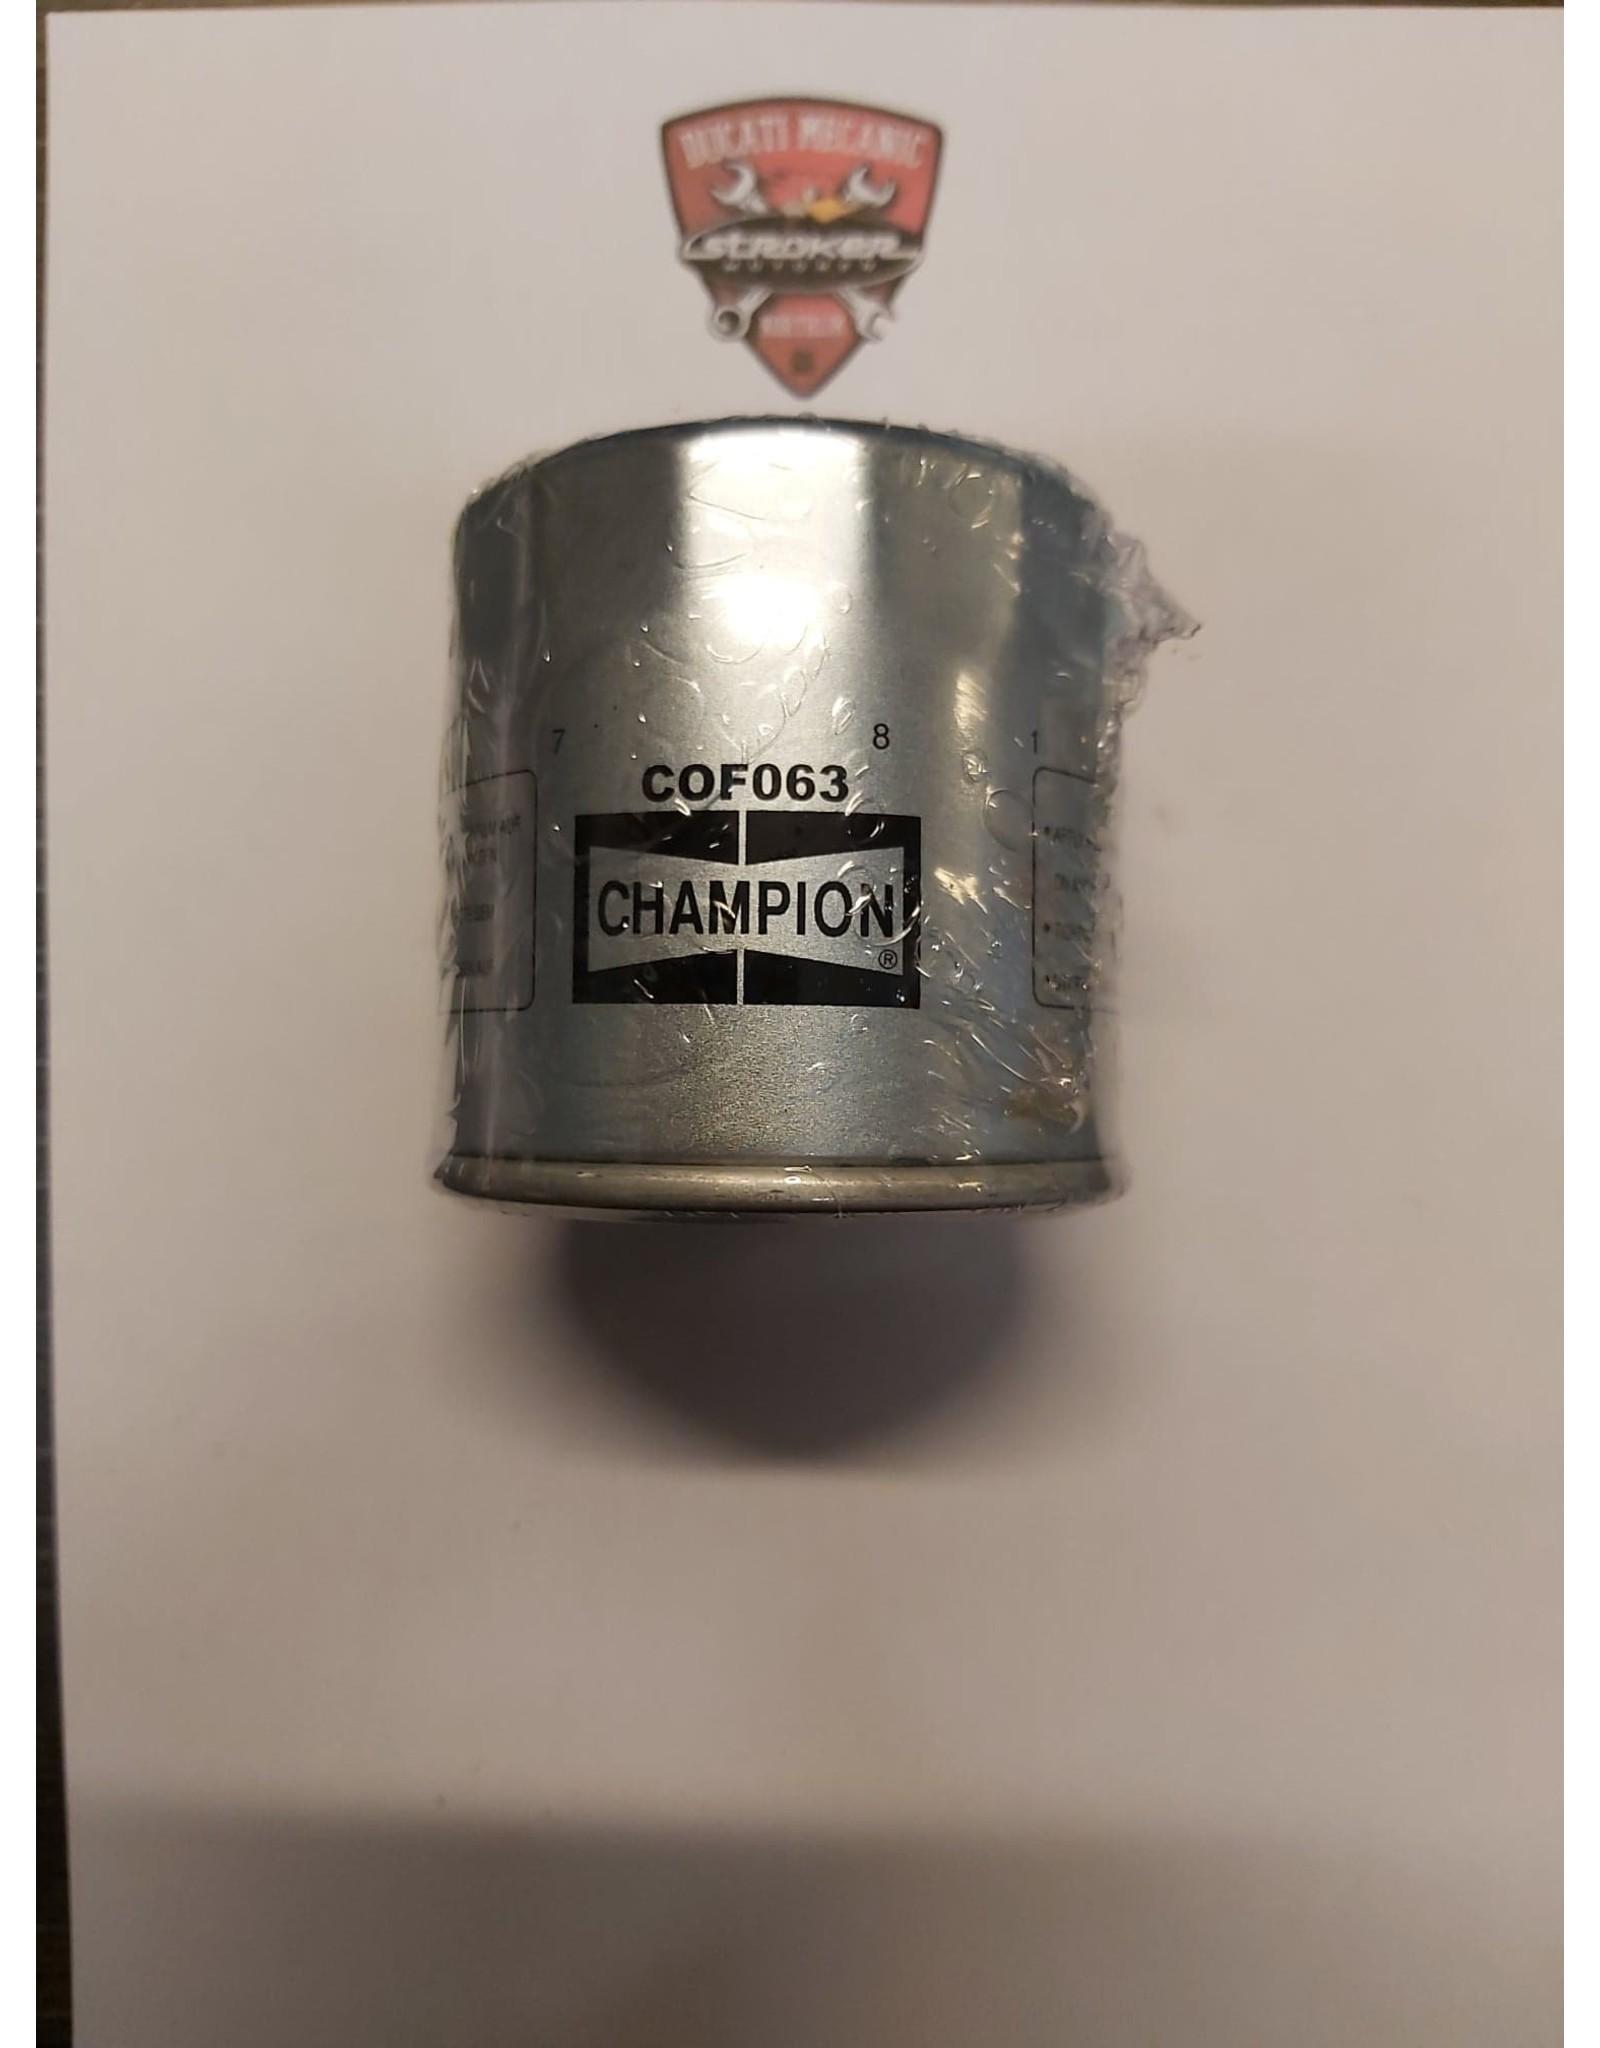 CHAMPION OLIEFILTER CHAMPION COF 063 (bmw)